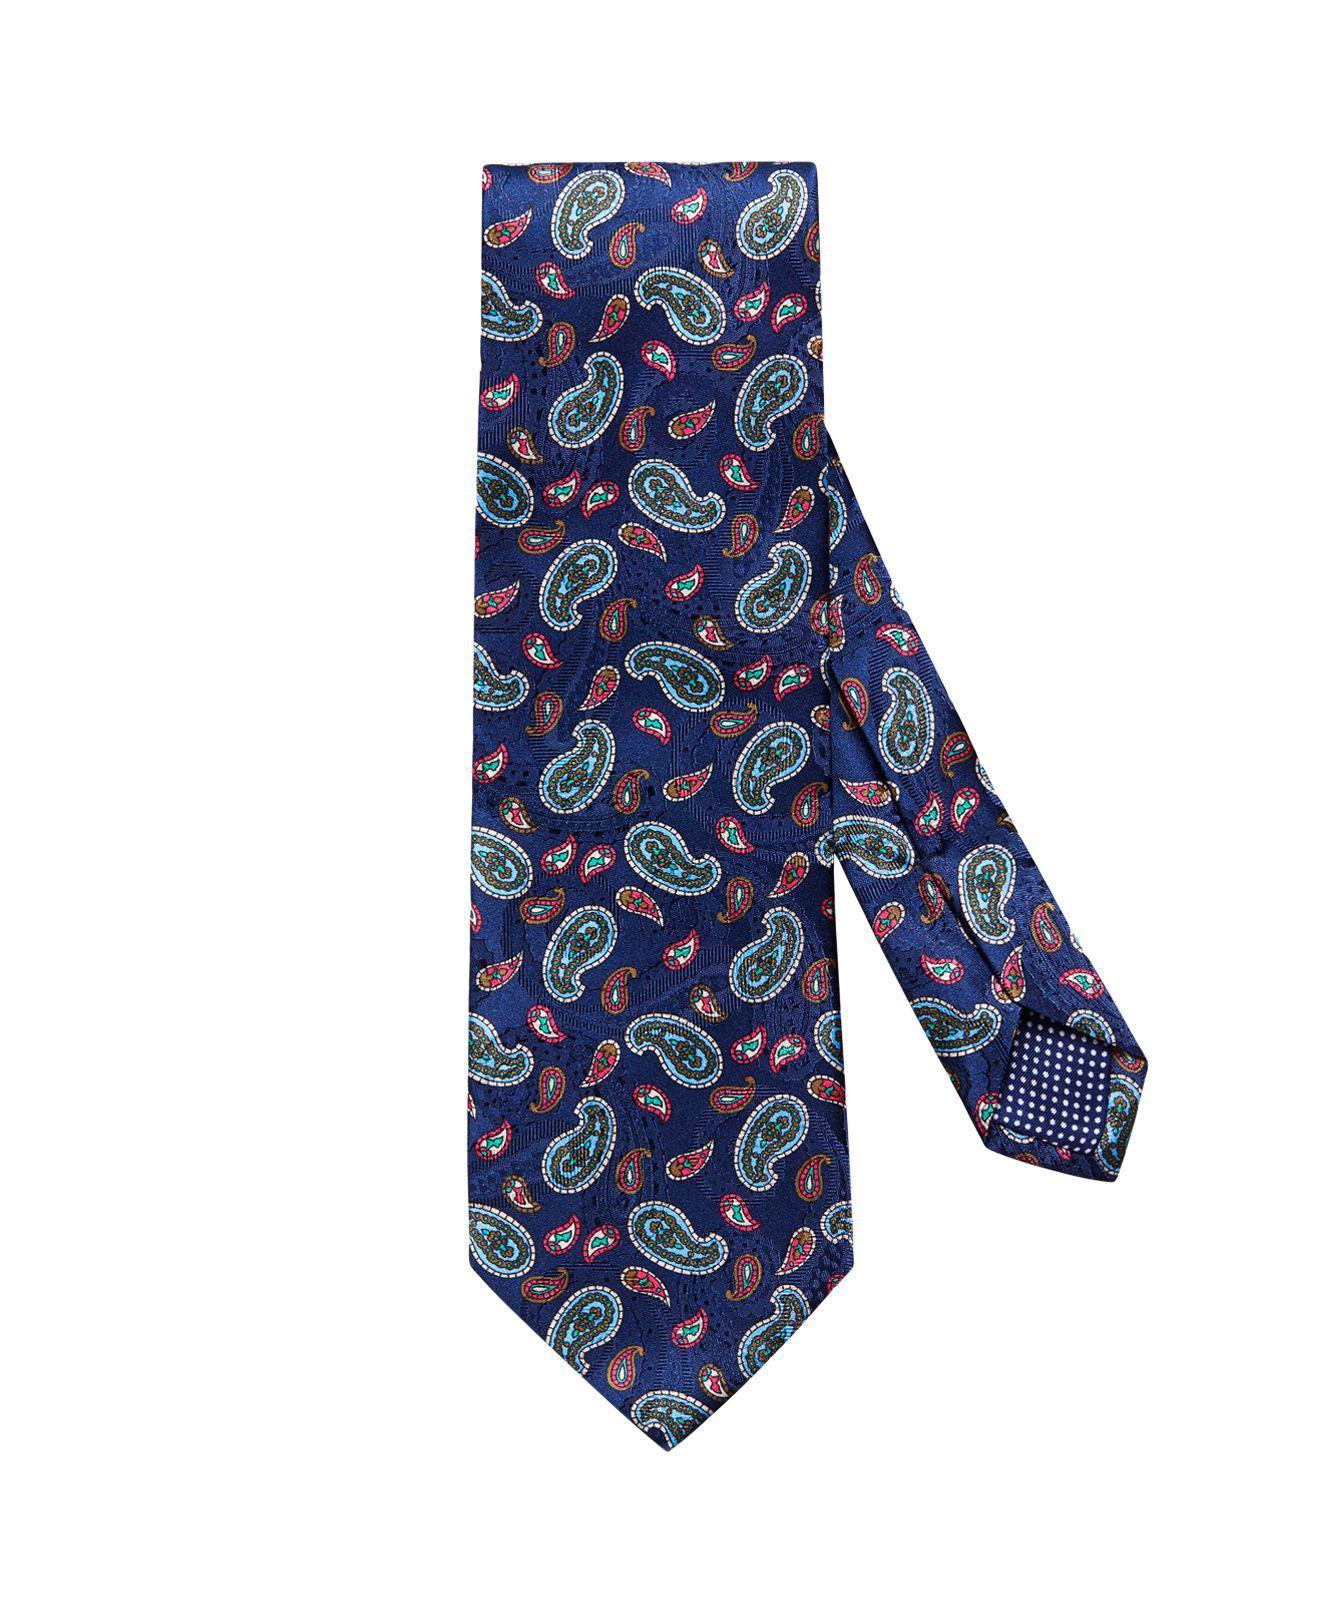 Blue Paisley Tie Eton wFOkv4